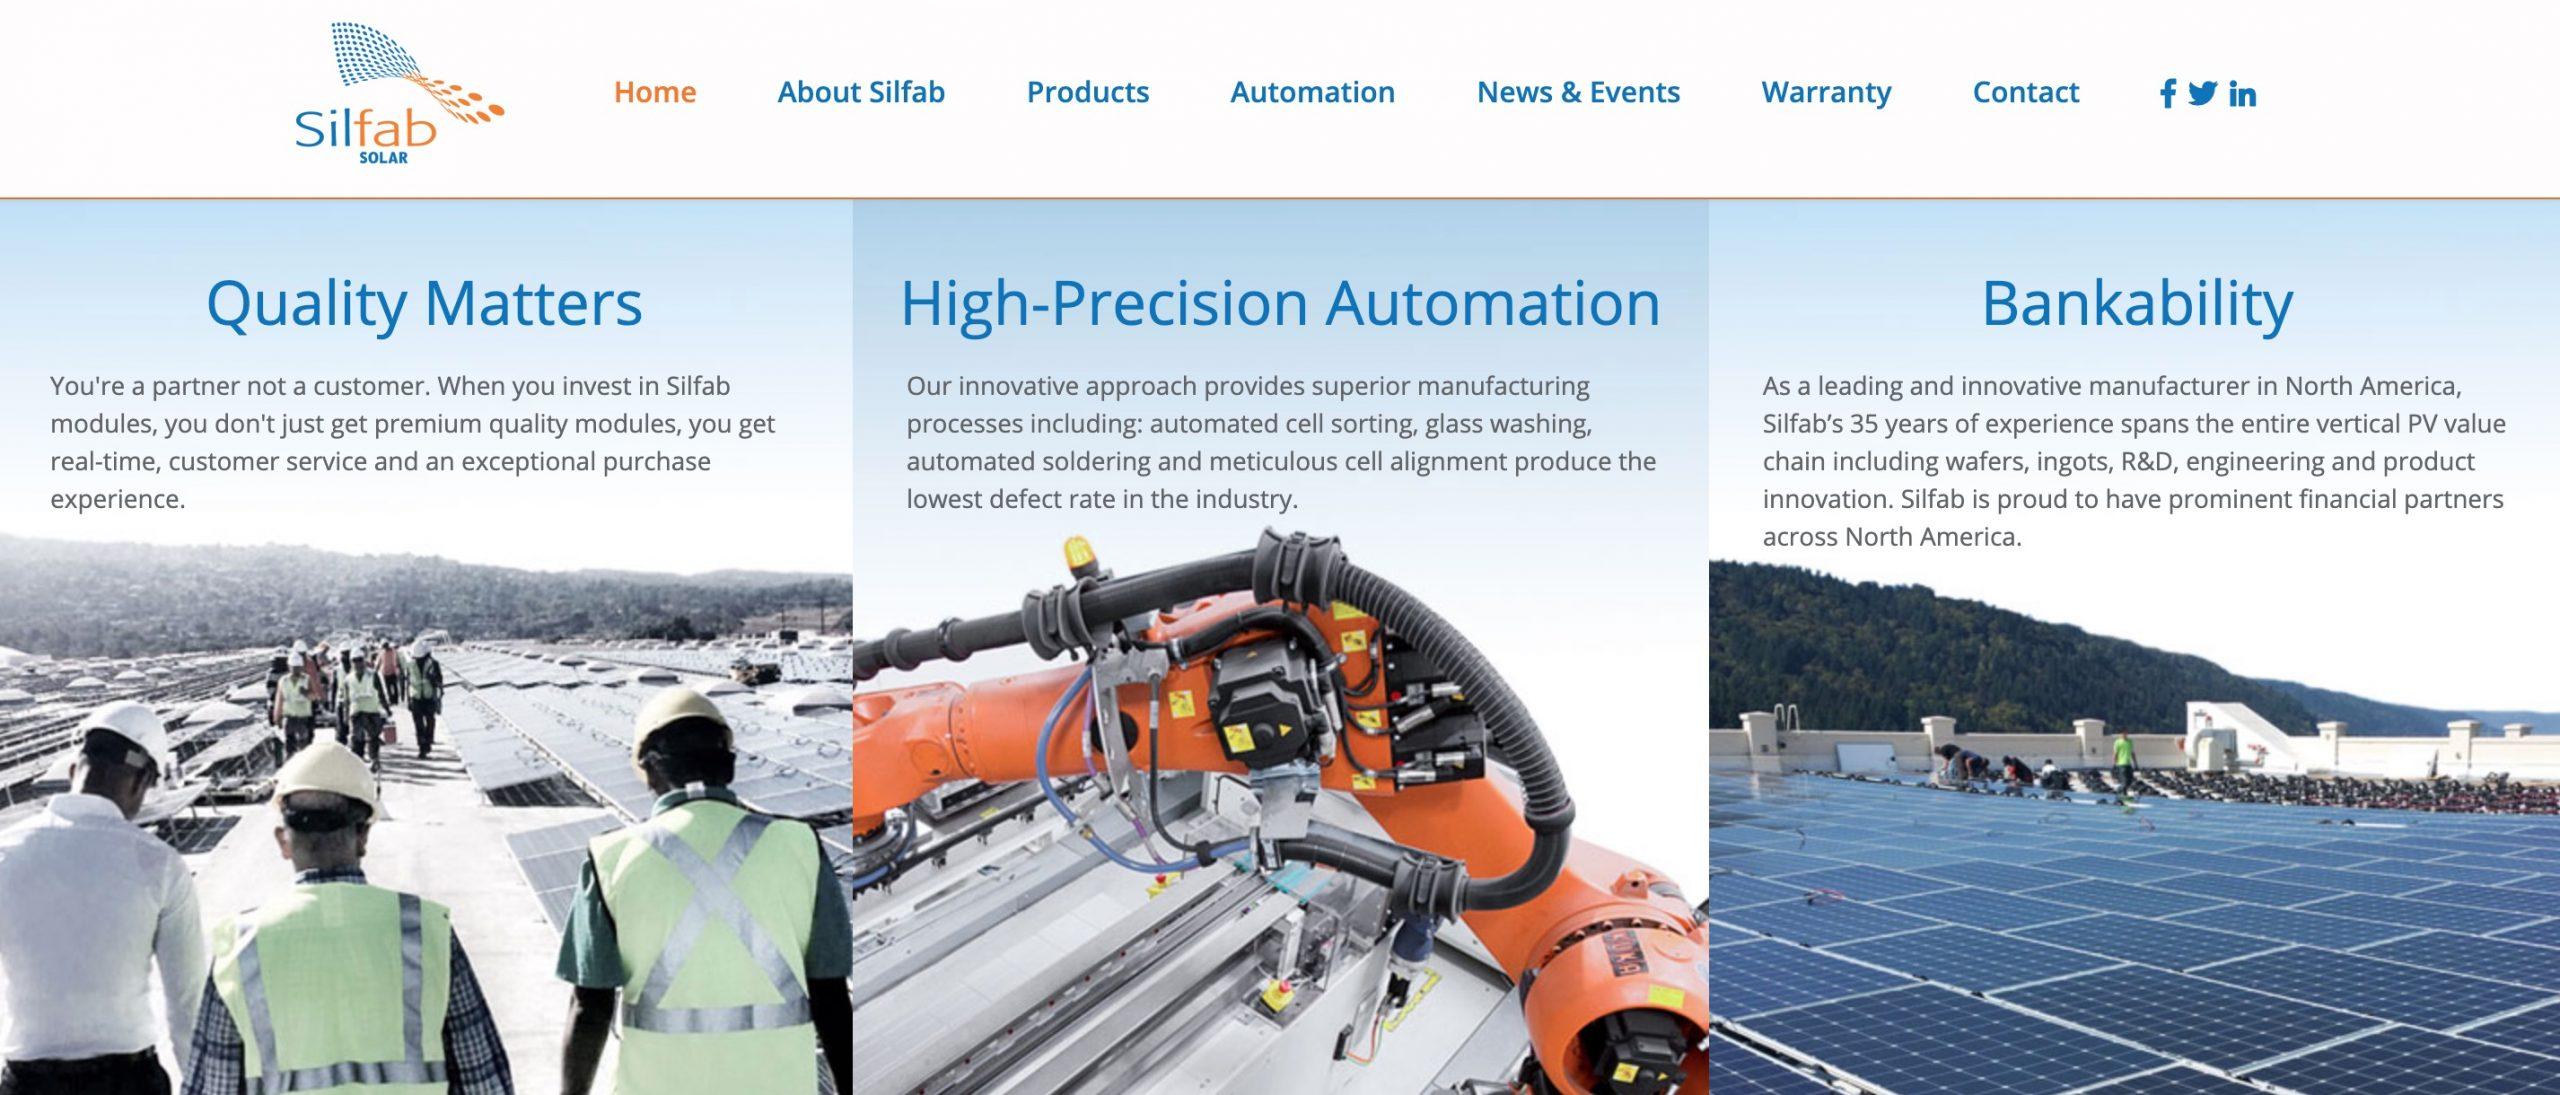 silfab solar panel main page